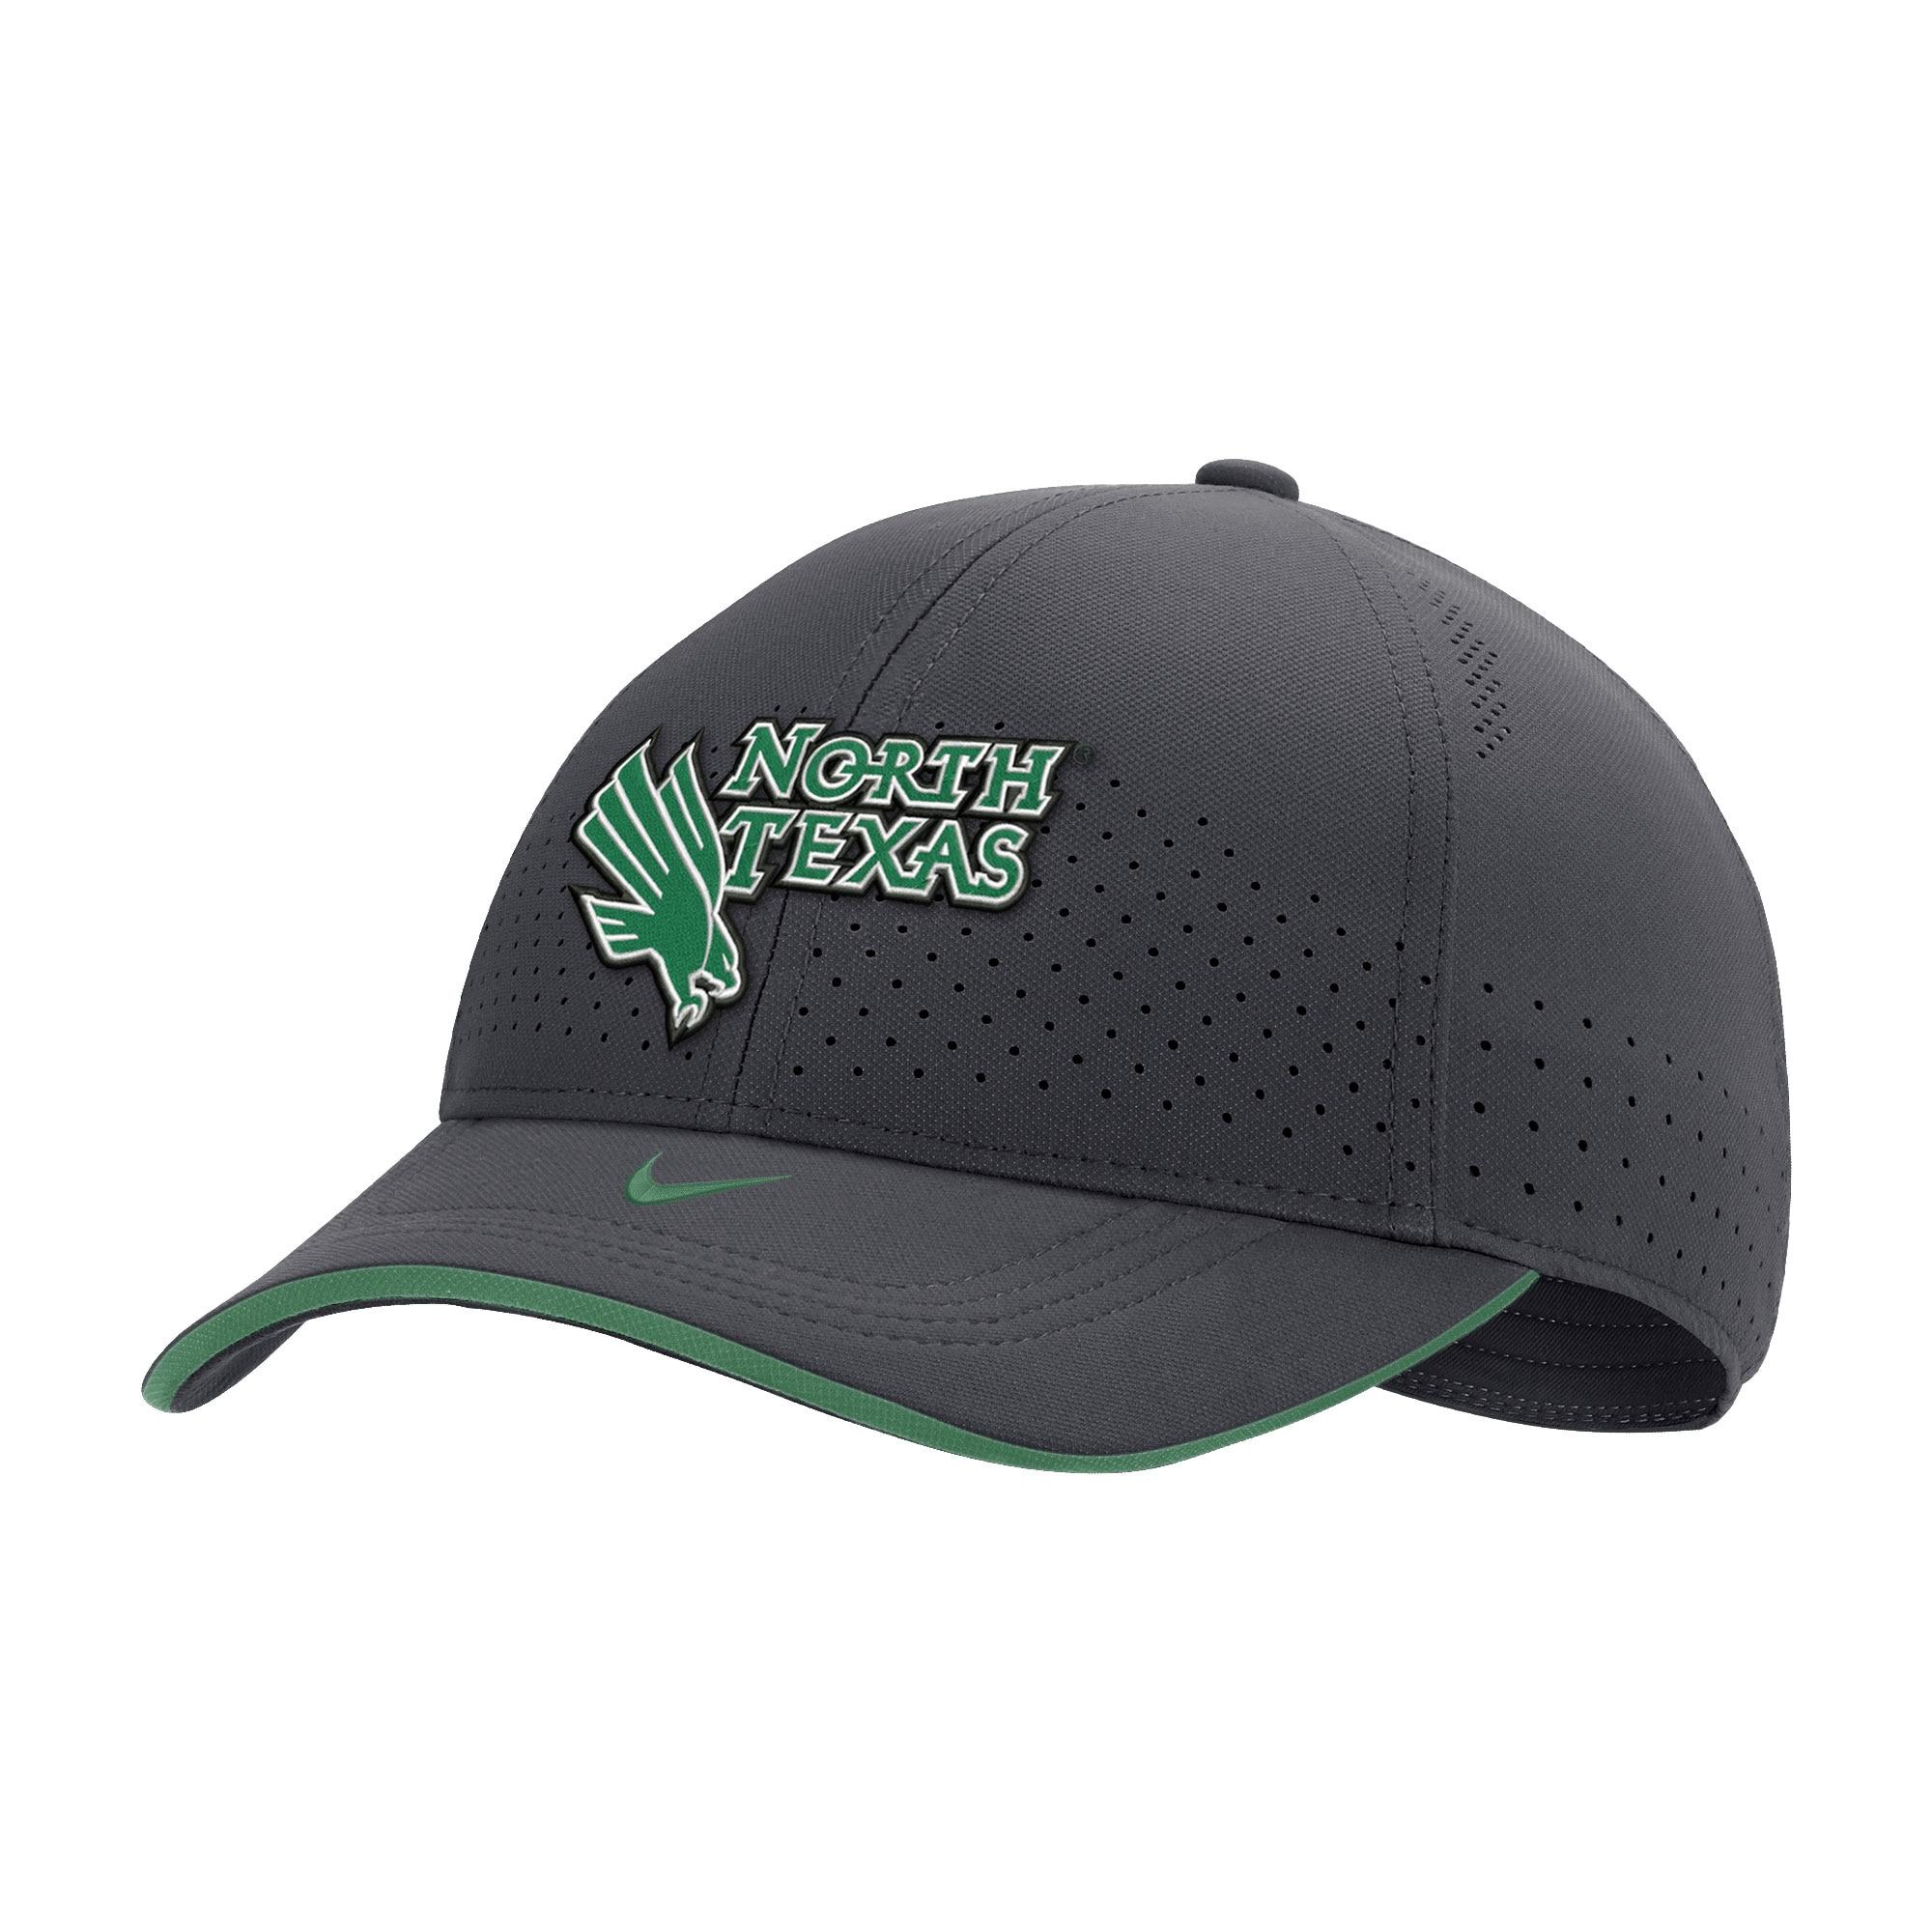 University of North Texas Nike Sideline 2020 L91 Adjustable Cap Hat